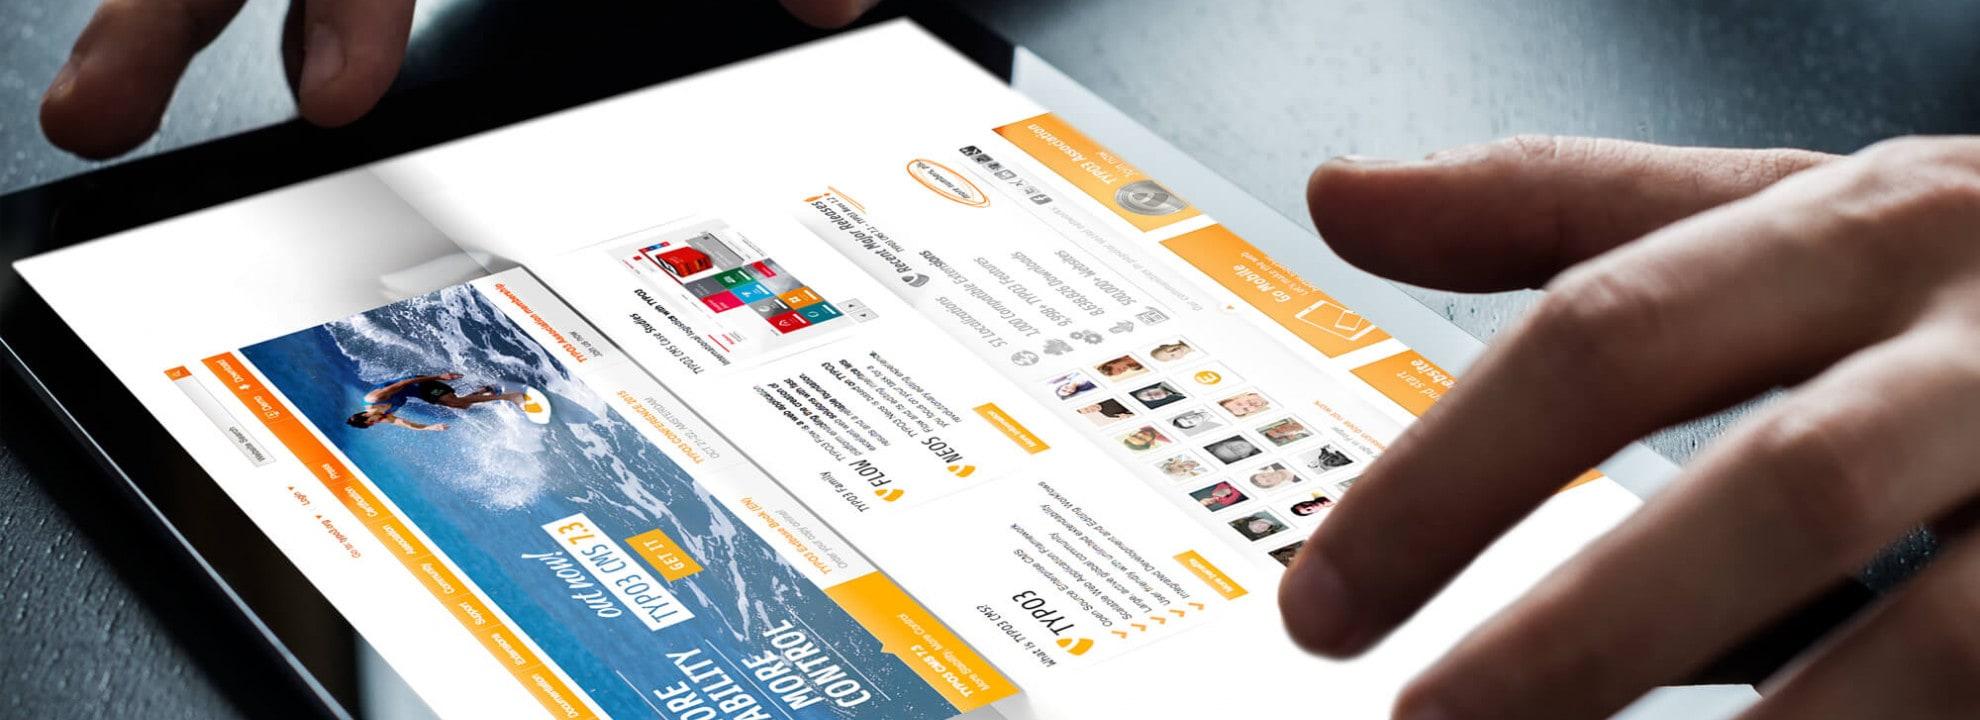 Web-Portale & Online-Plattformen